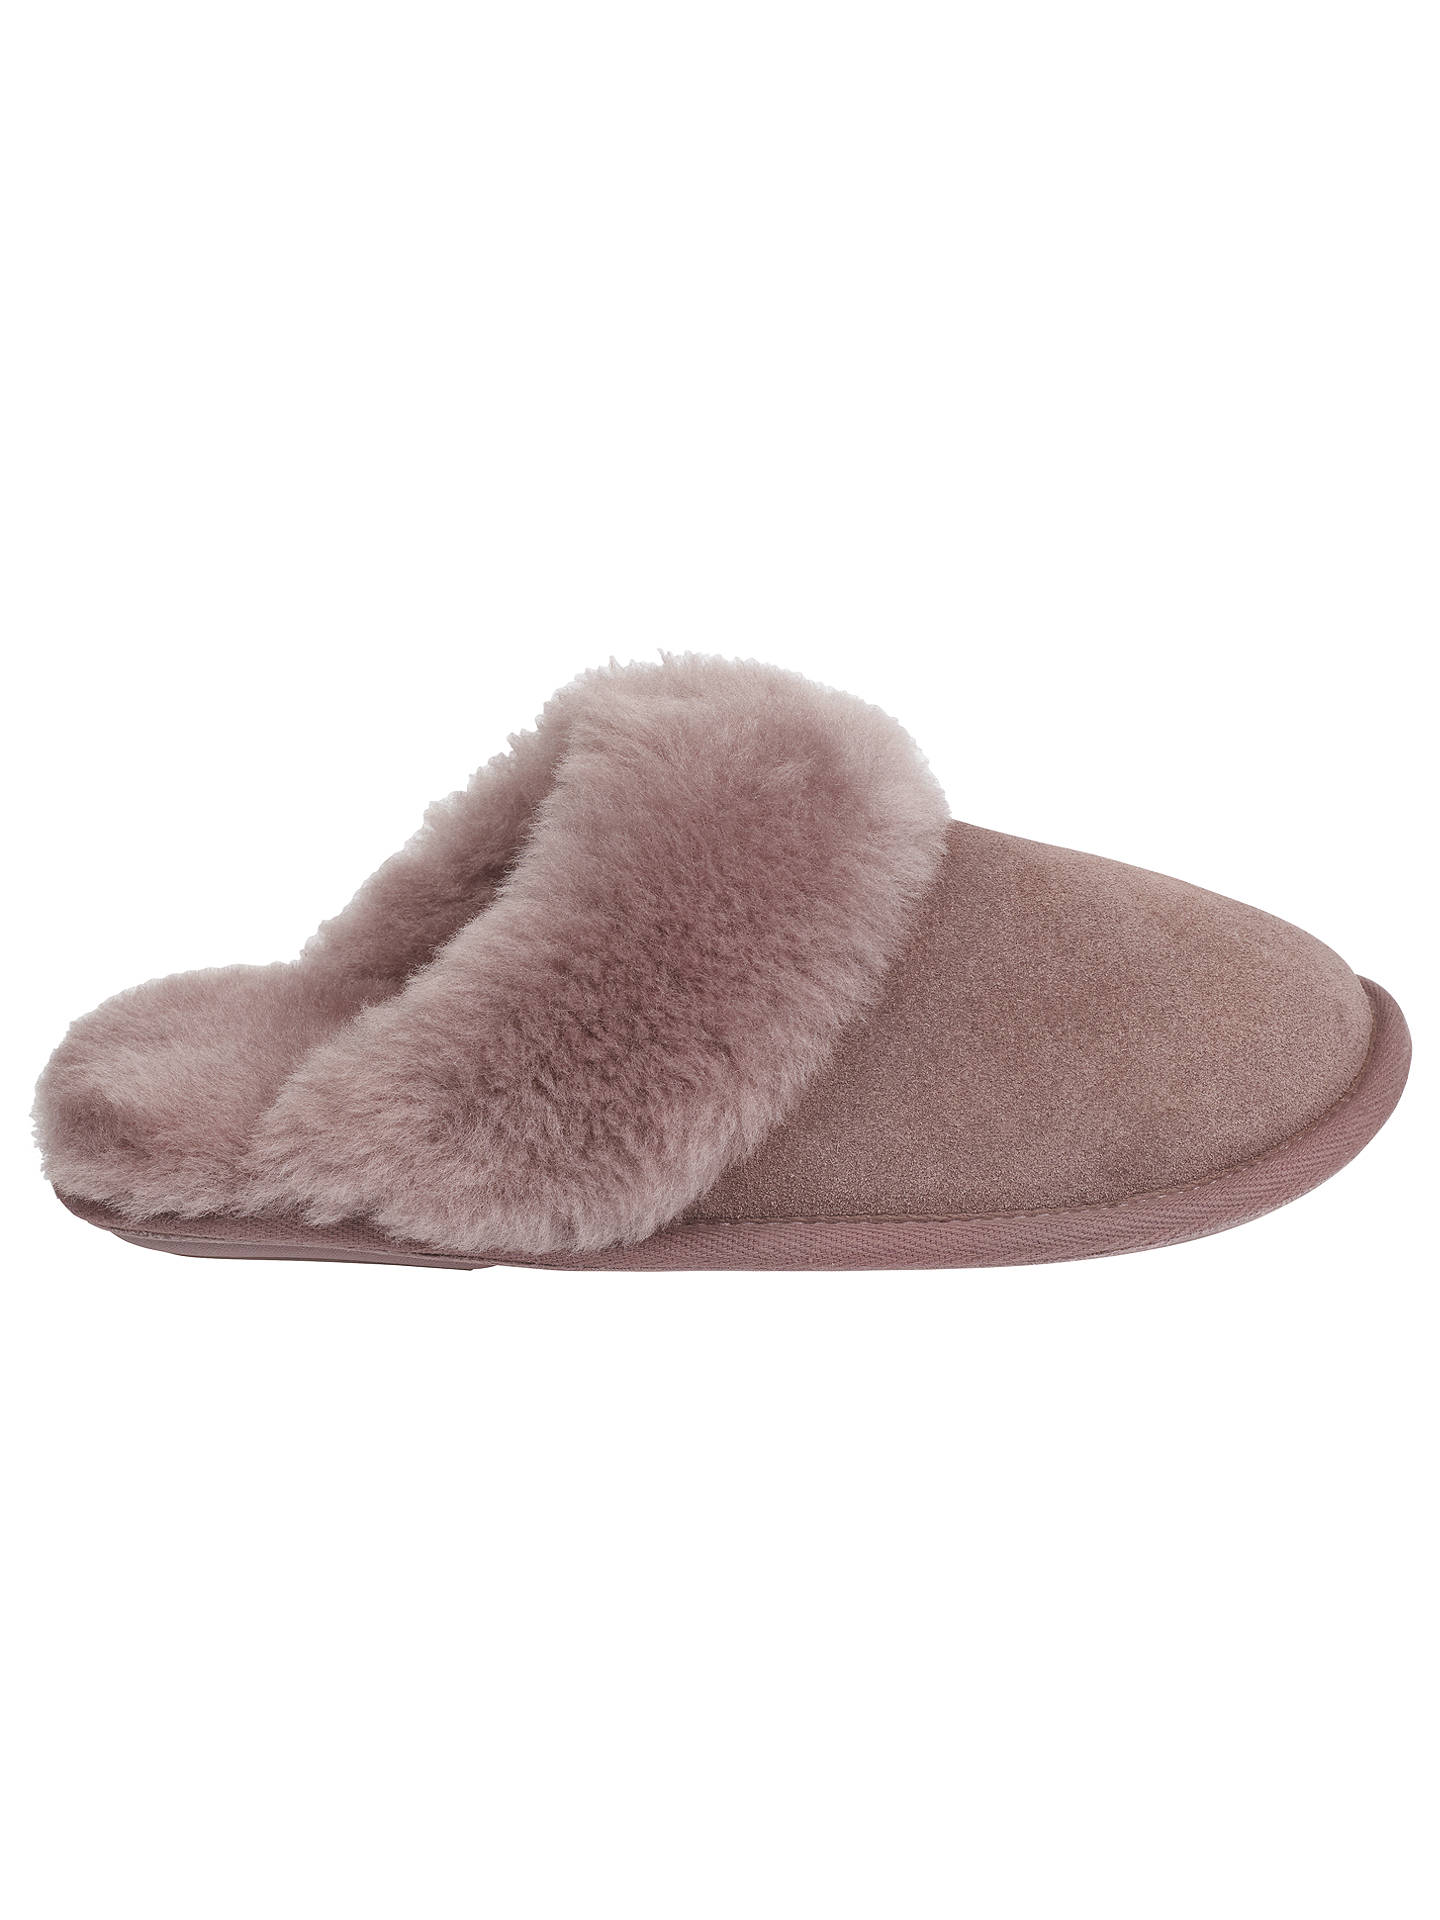 fb372c0d4a739 Buy Just Sheepskin Duchess Mule Slippers, Blush, 5-6 Online at johnlewis.